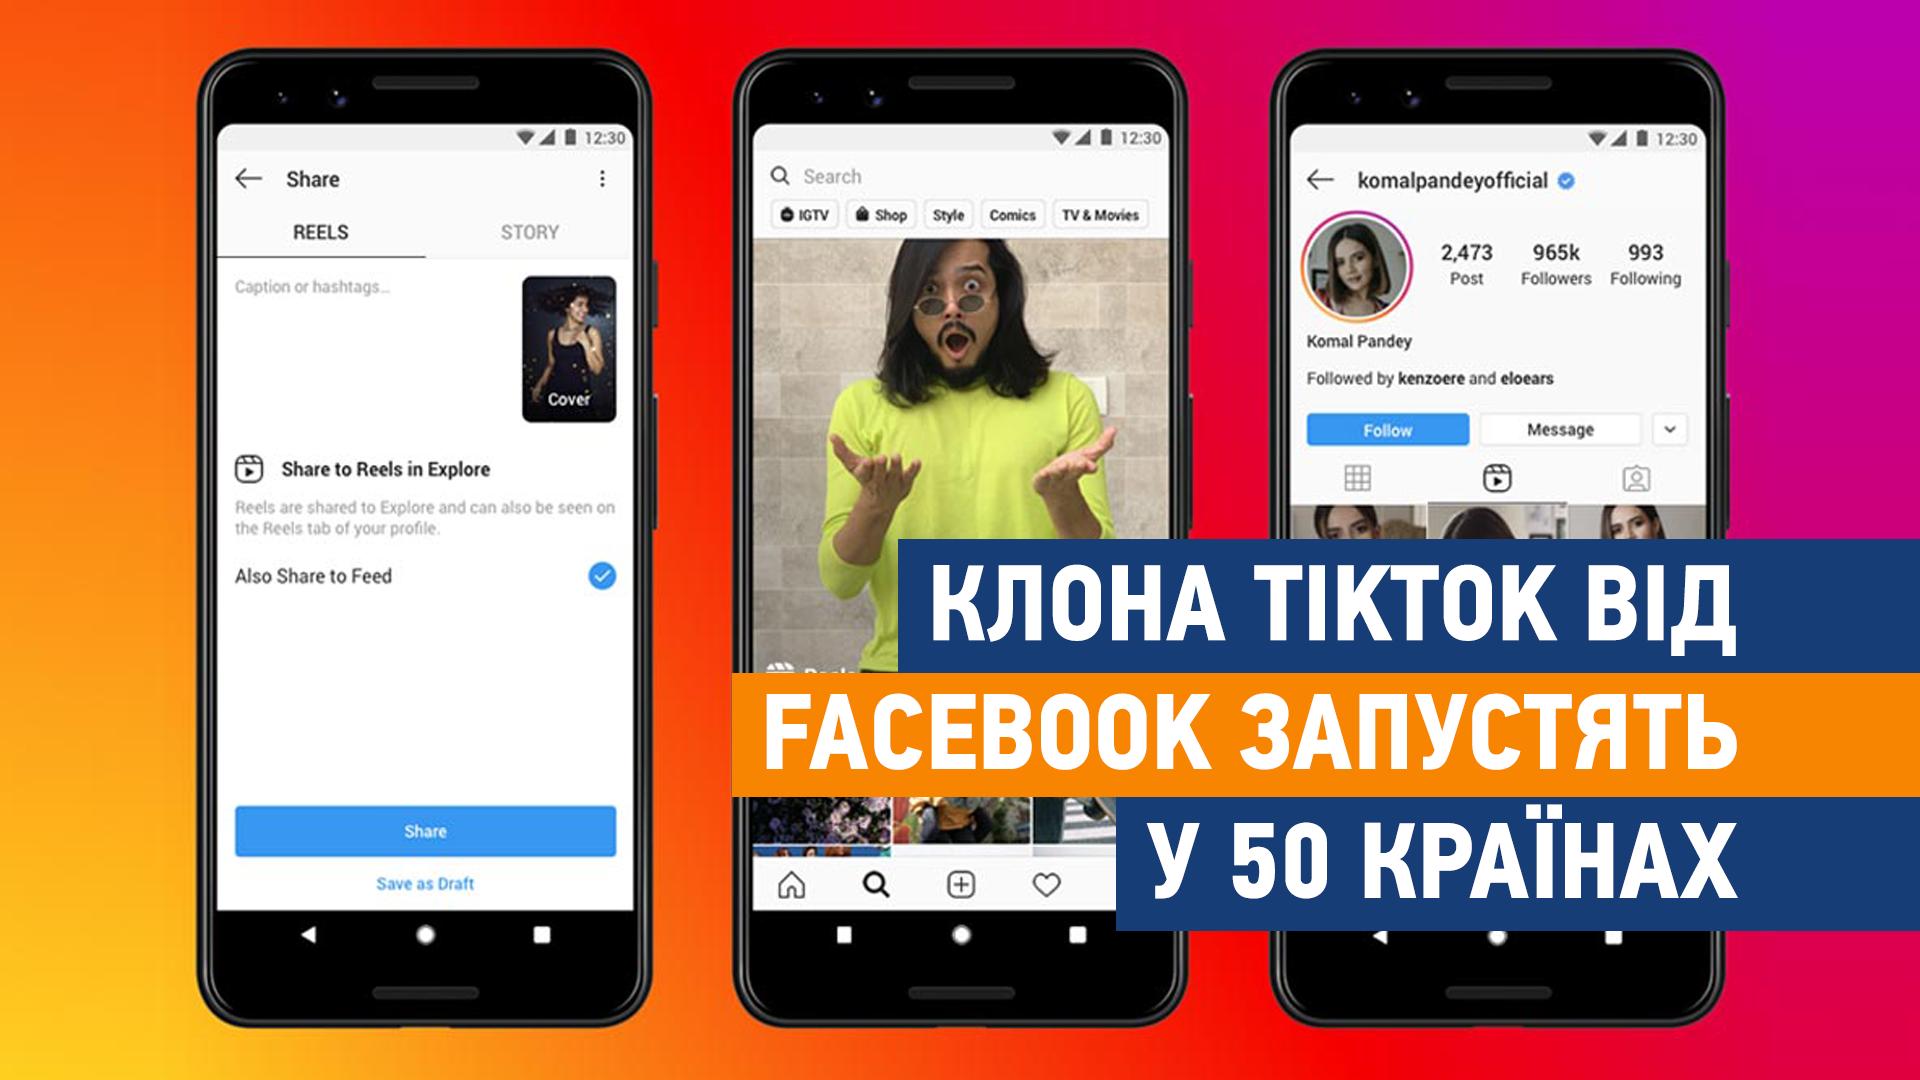 Клона TikTok від Facebook запустять у 50 країнах - відео, youtube, Instagram, Facebook - tiktok poglyad